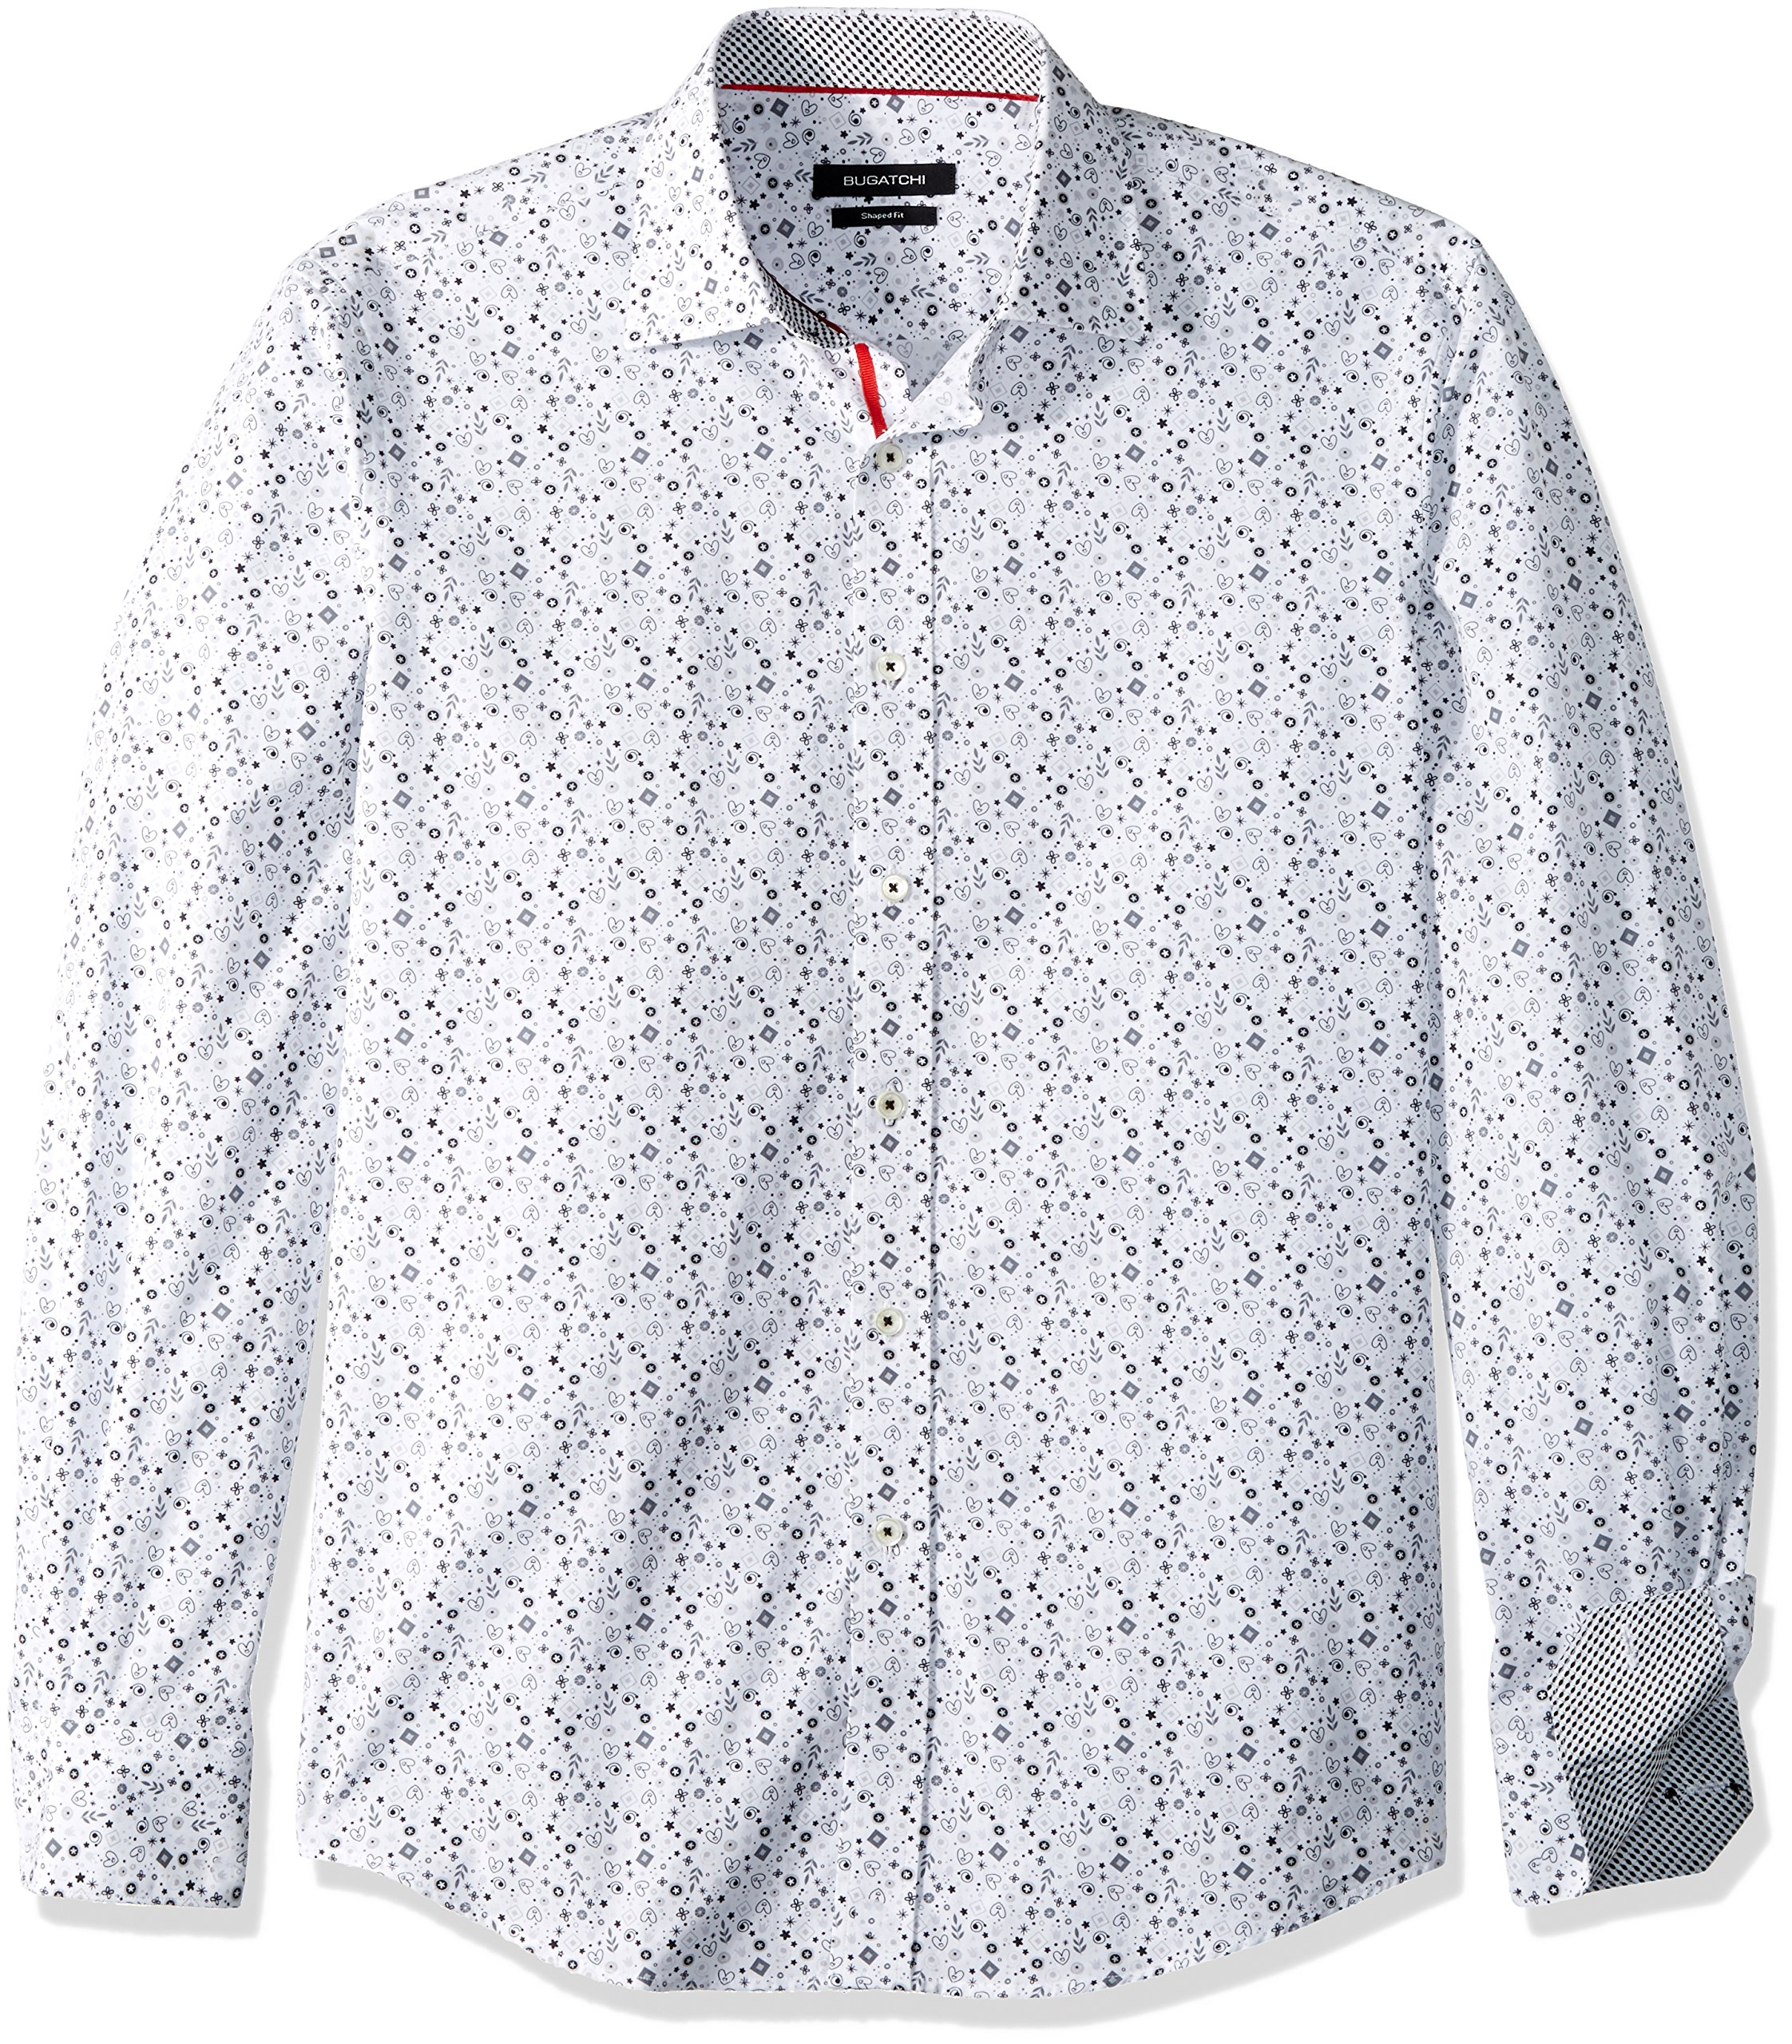 Bugatchi Men's Cotton Slim Fit Button Down Shirt, White, XL